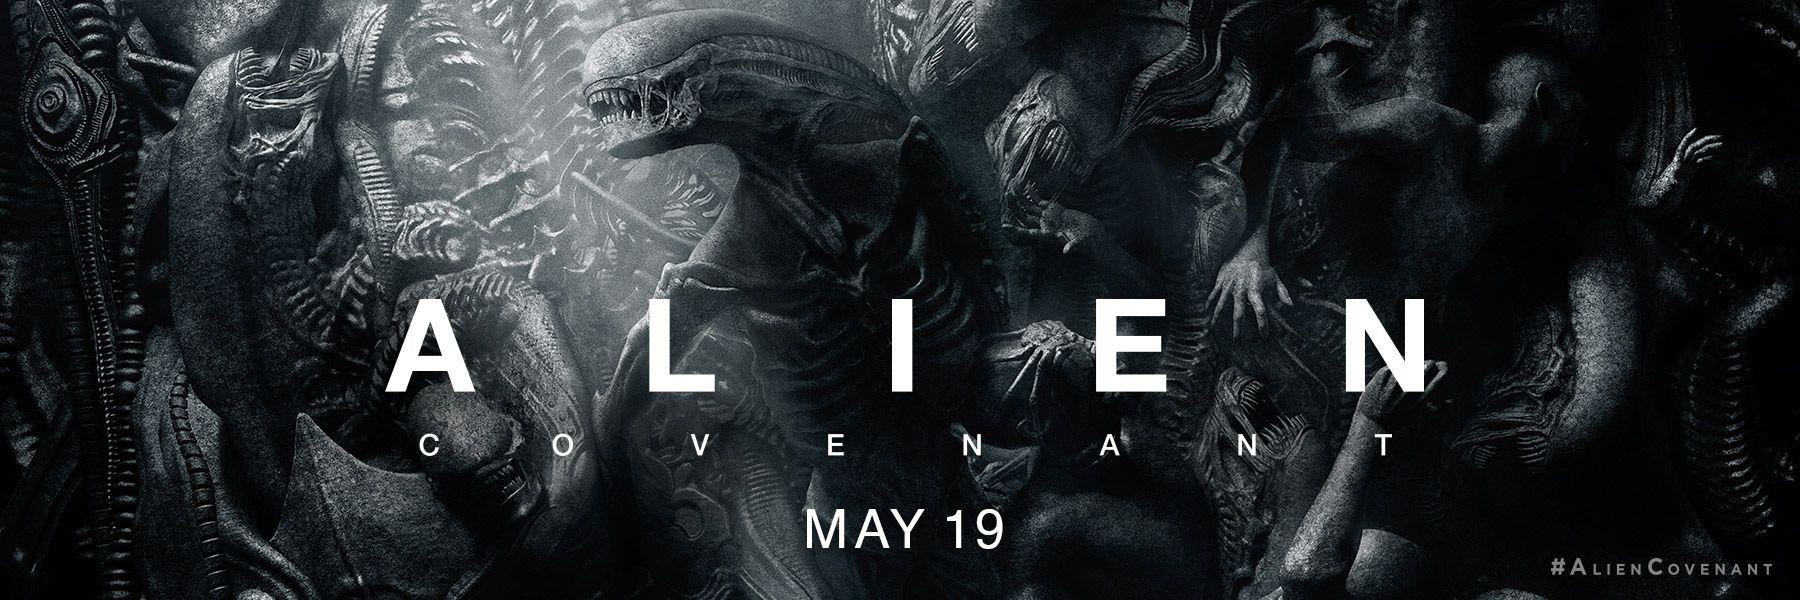 Watch Movie Alien Covenat The Covenant Hd Movies Alien Covenant